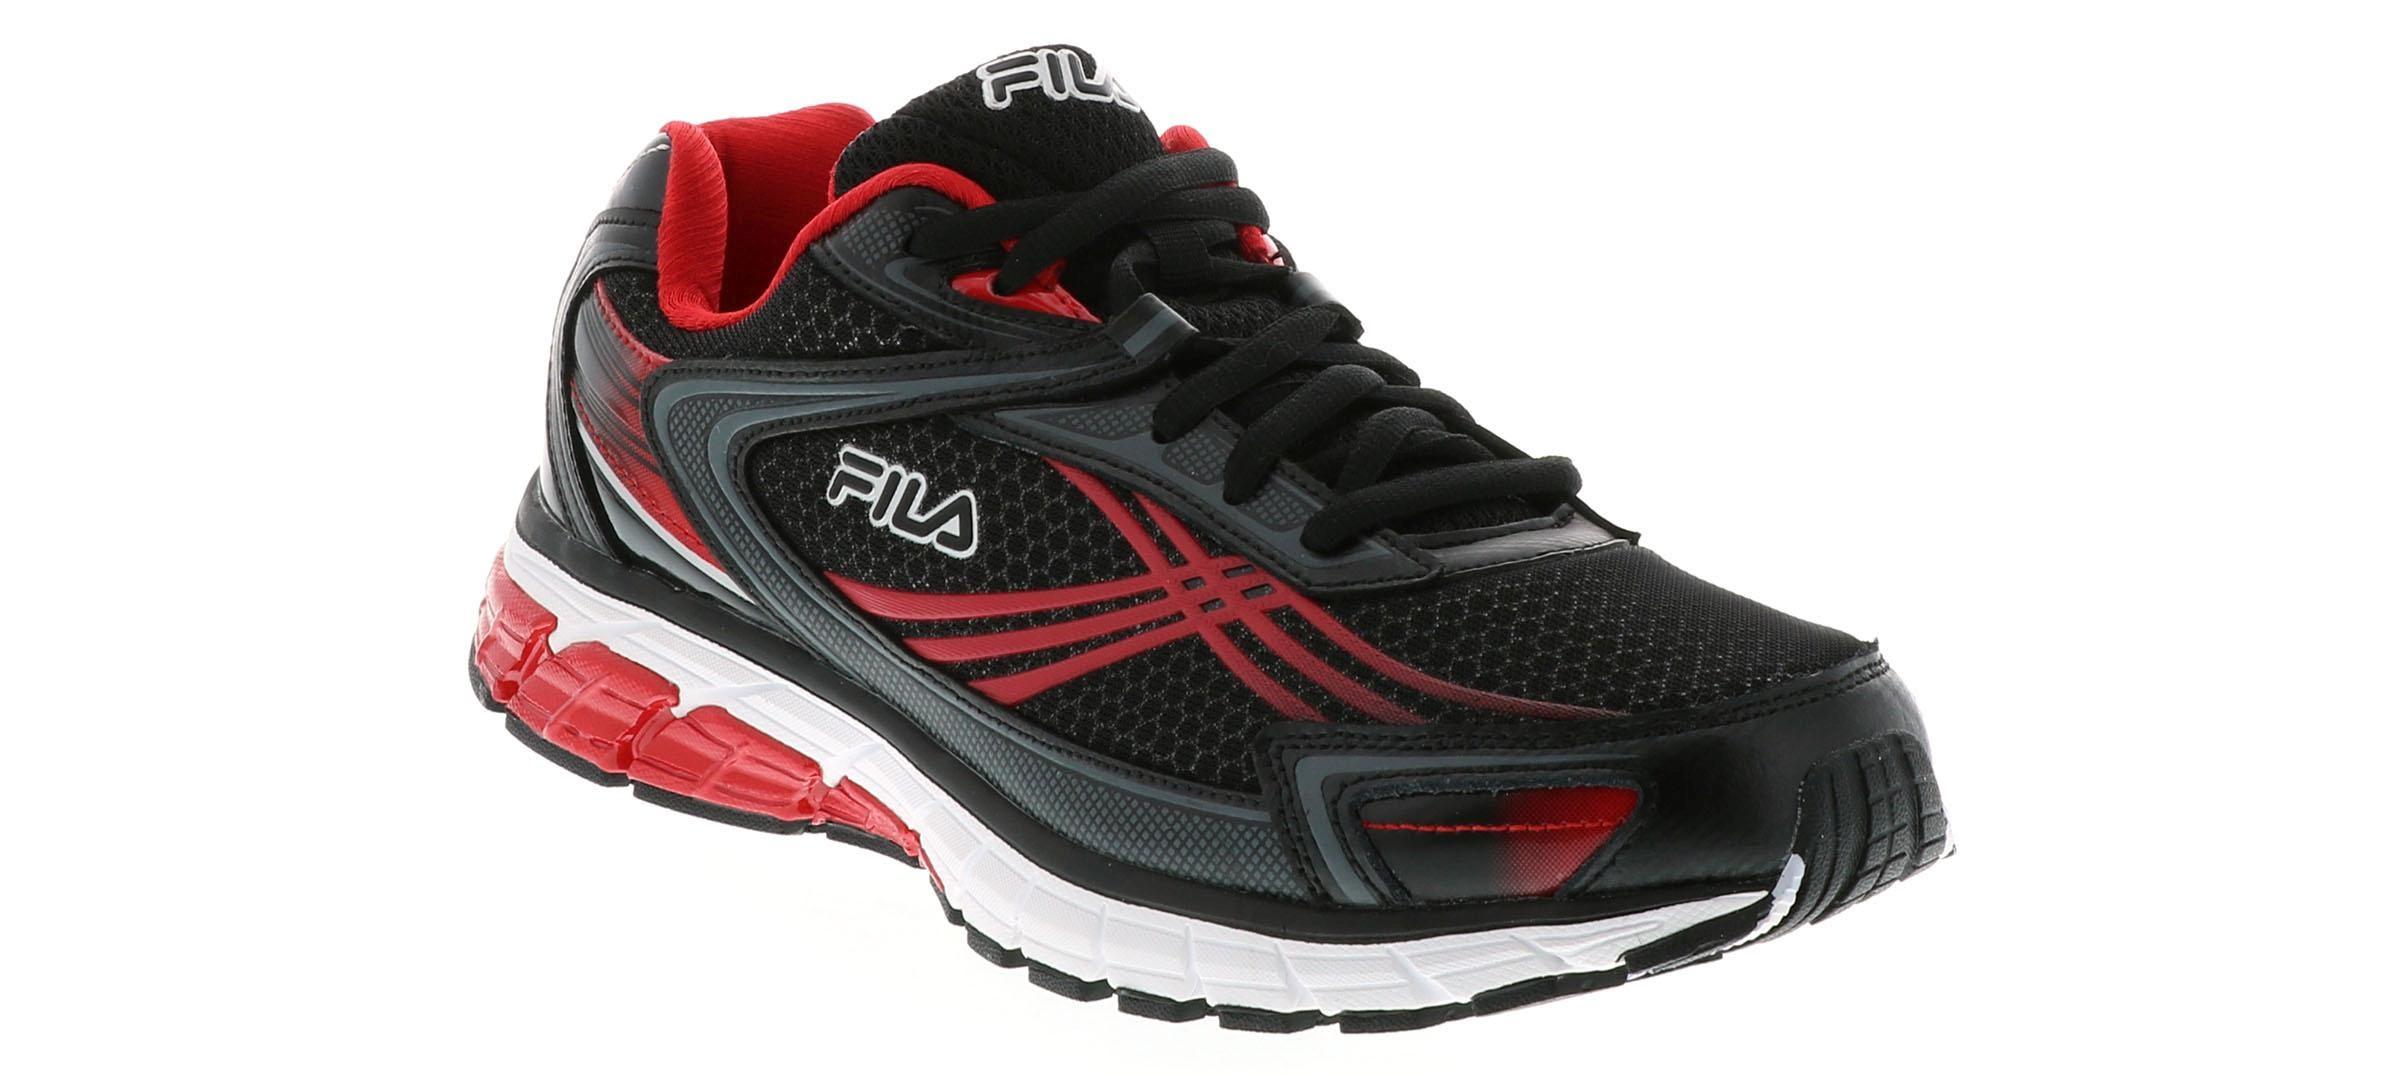 Men's Fila Nitro Fuel Energized 2 Black Shoe Sensation  Shoe Sensation